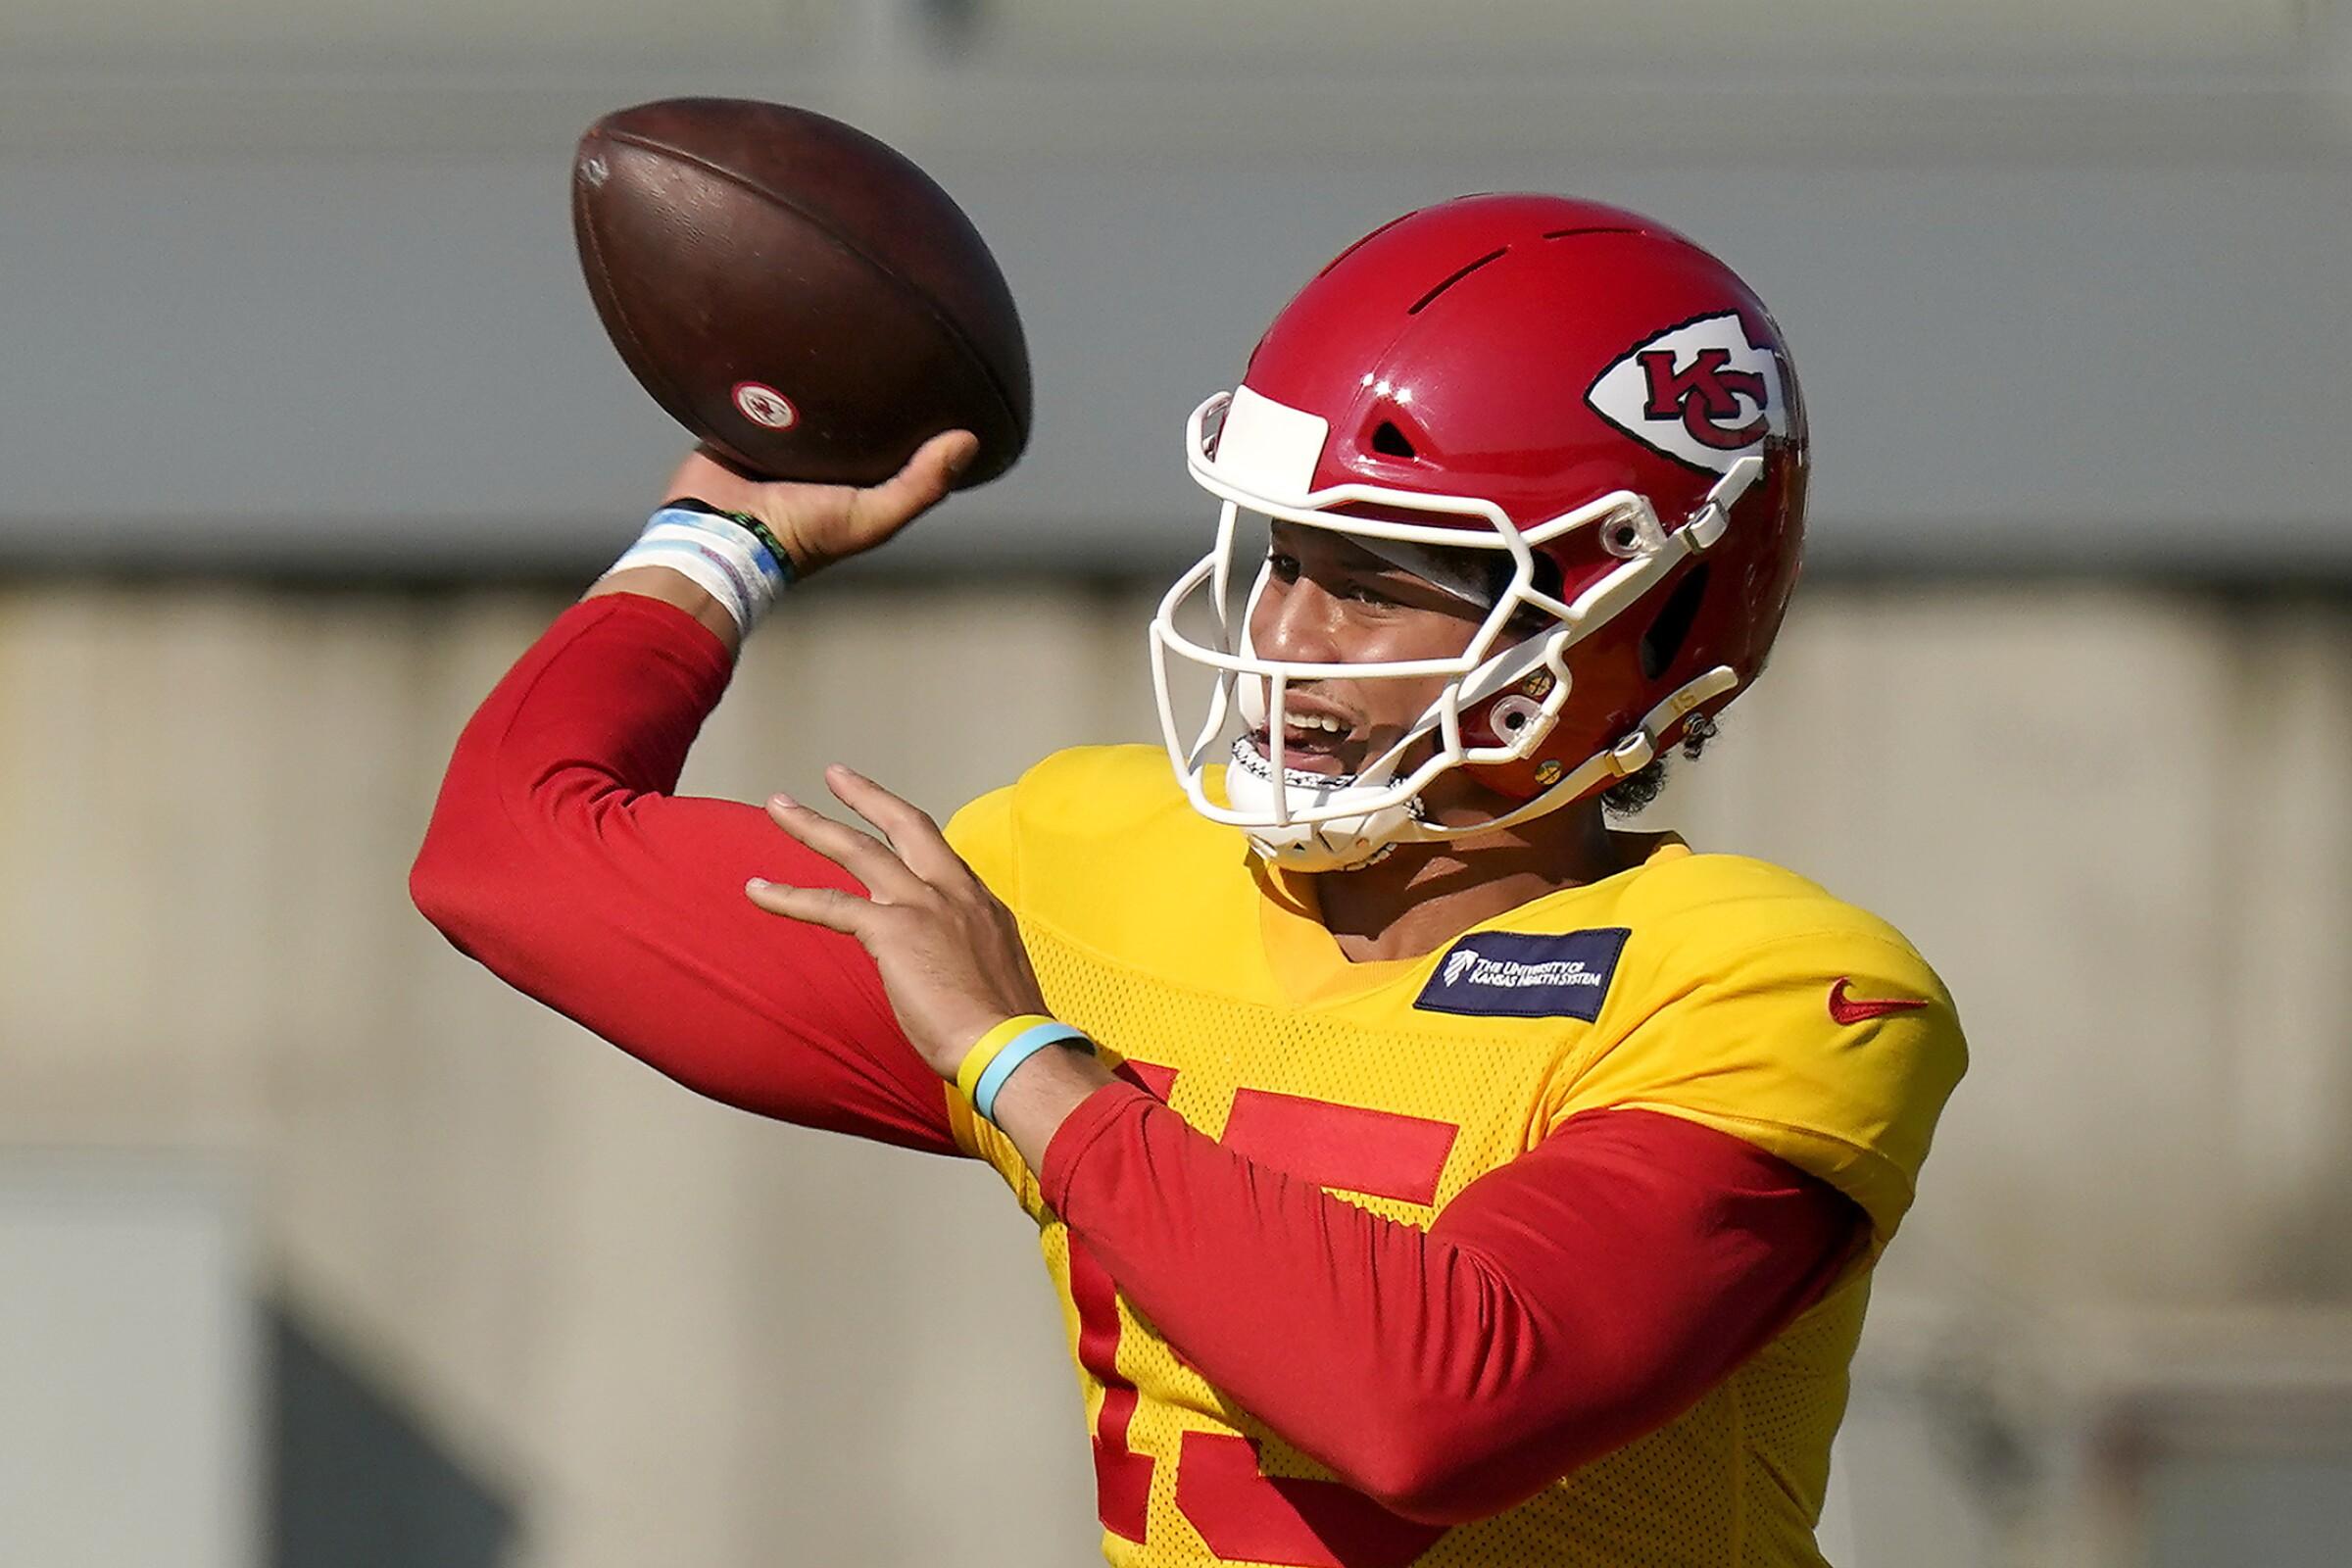 Kansas City Chiefs quarterback Patrick Mahomes passes during an NFL football training camp.